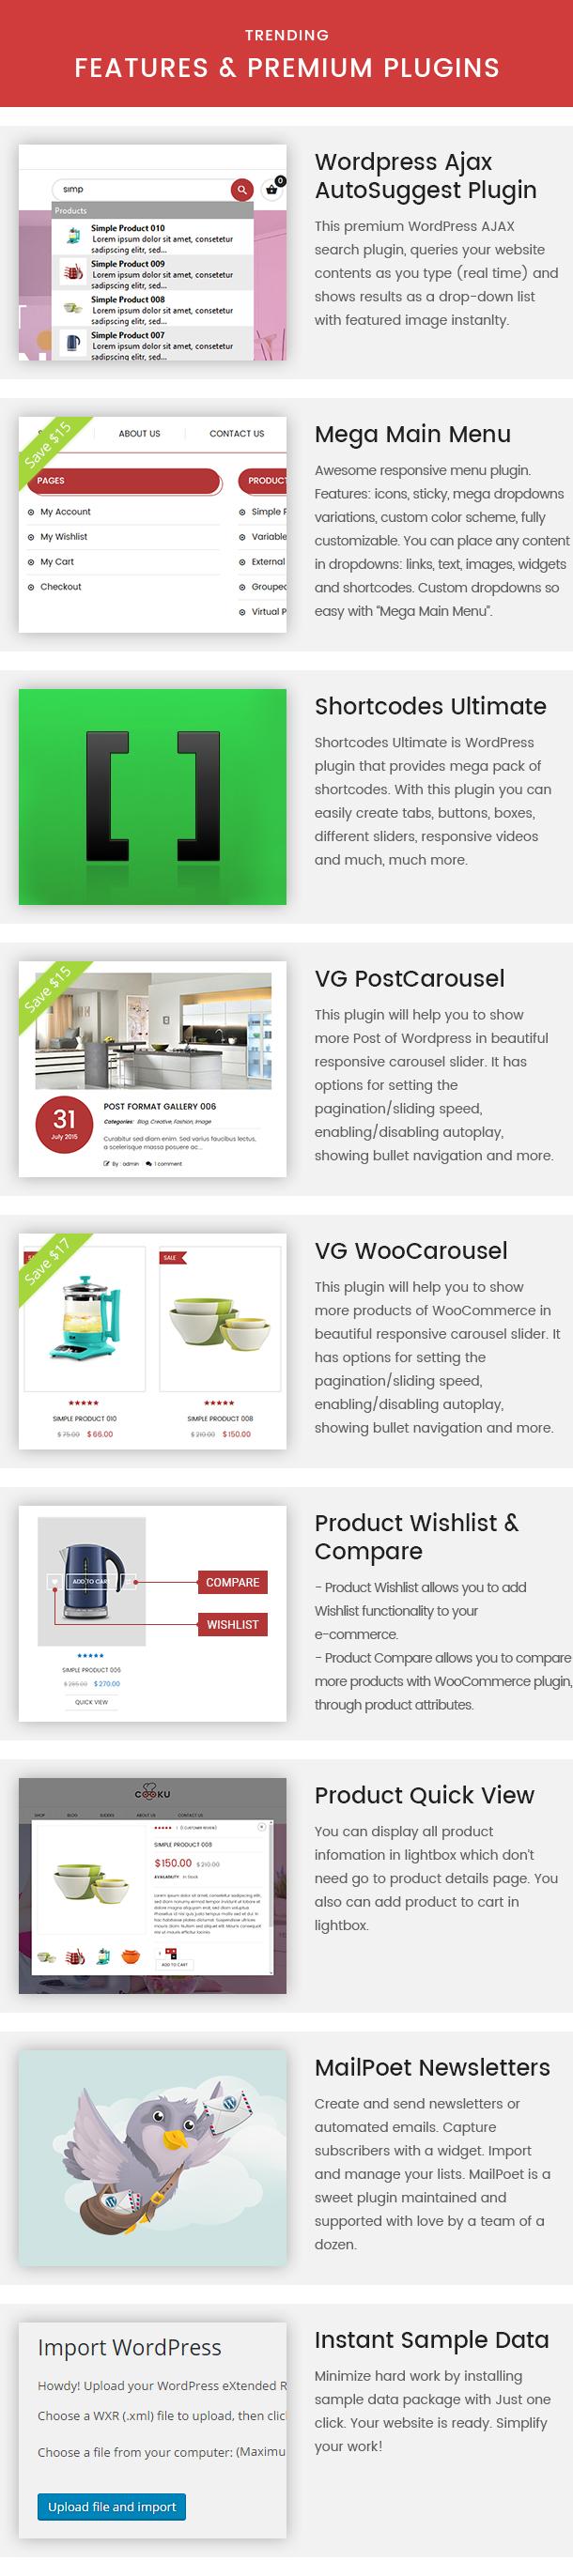 VG Cooku - Clean, Simple WooCommerce WordPress Theme - 29